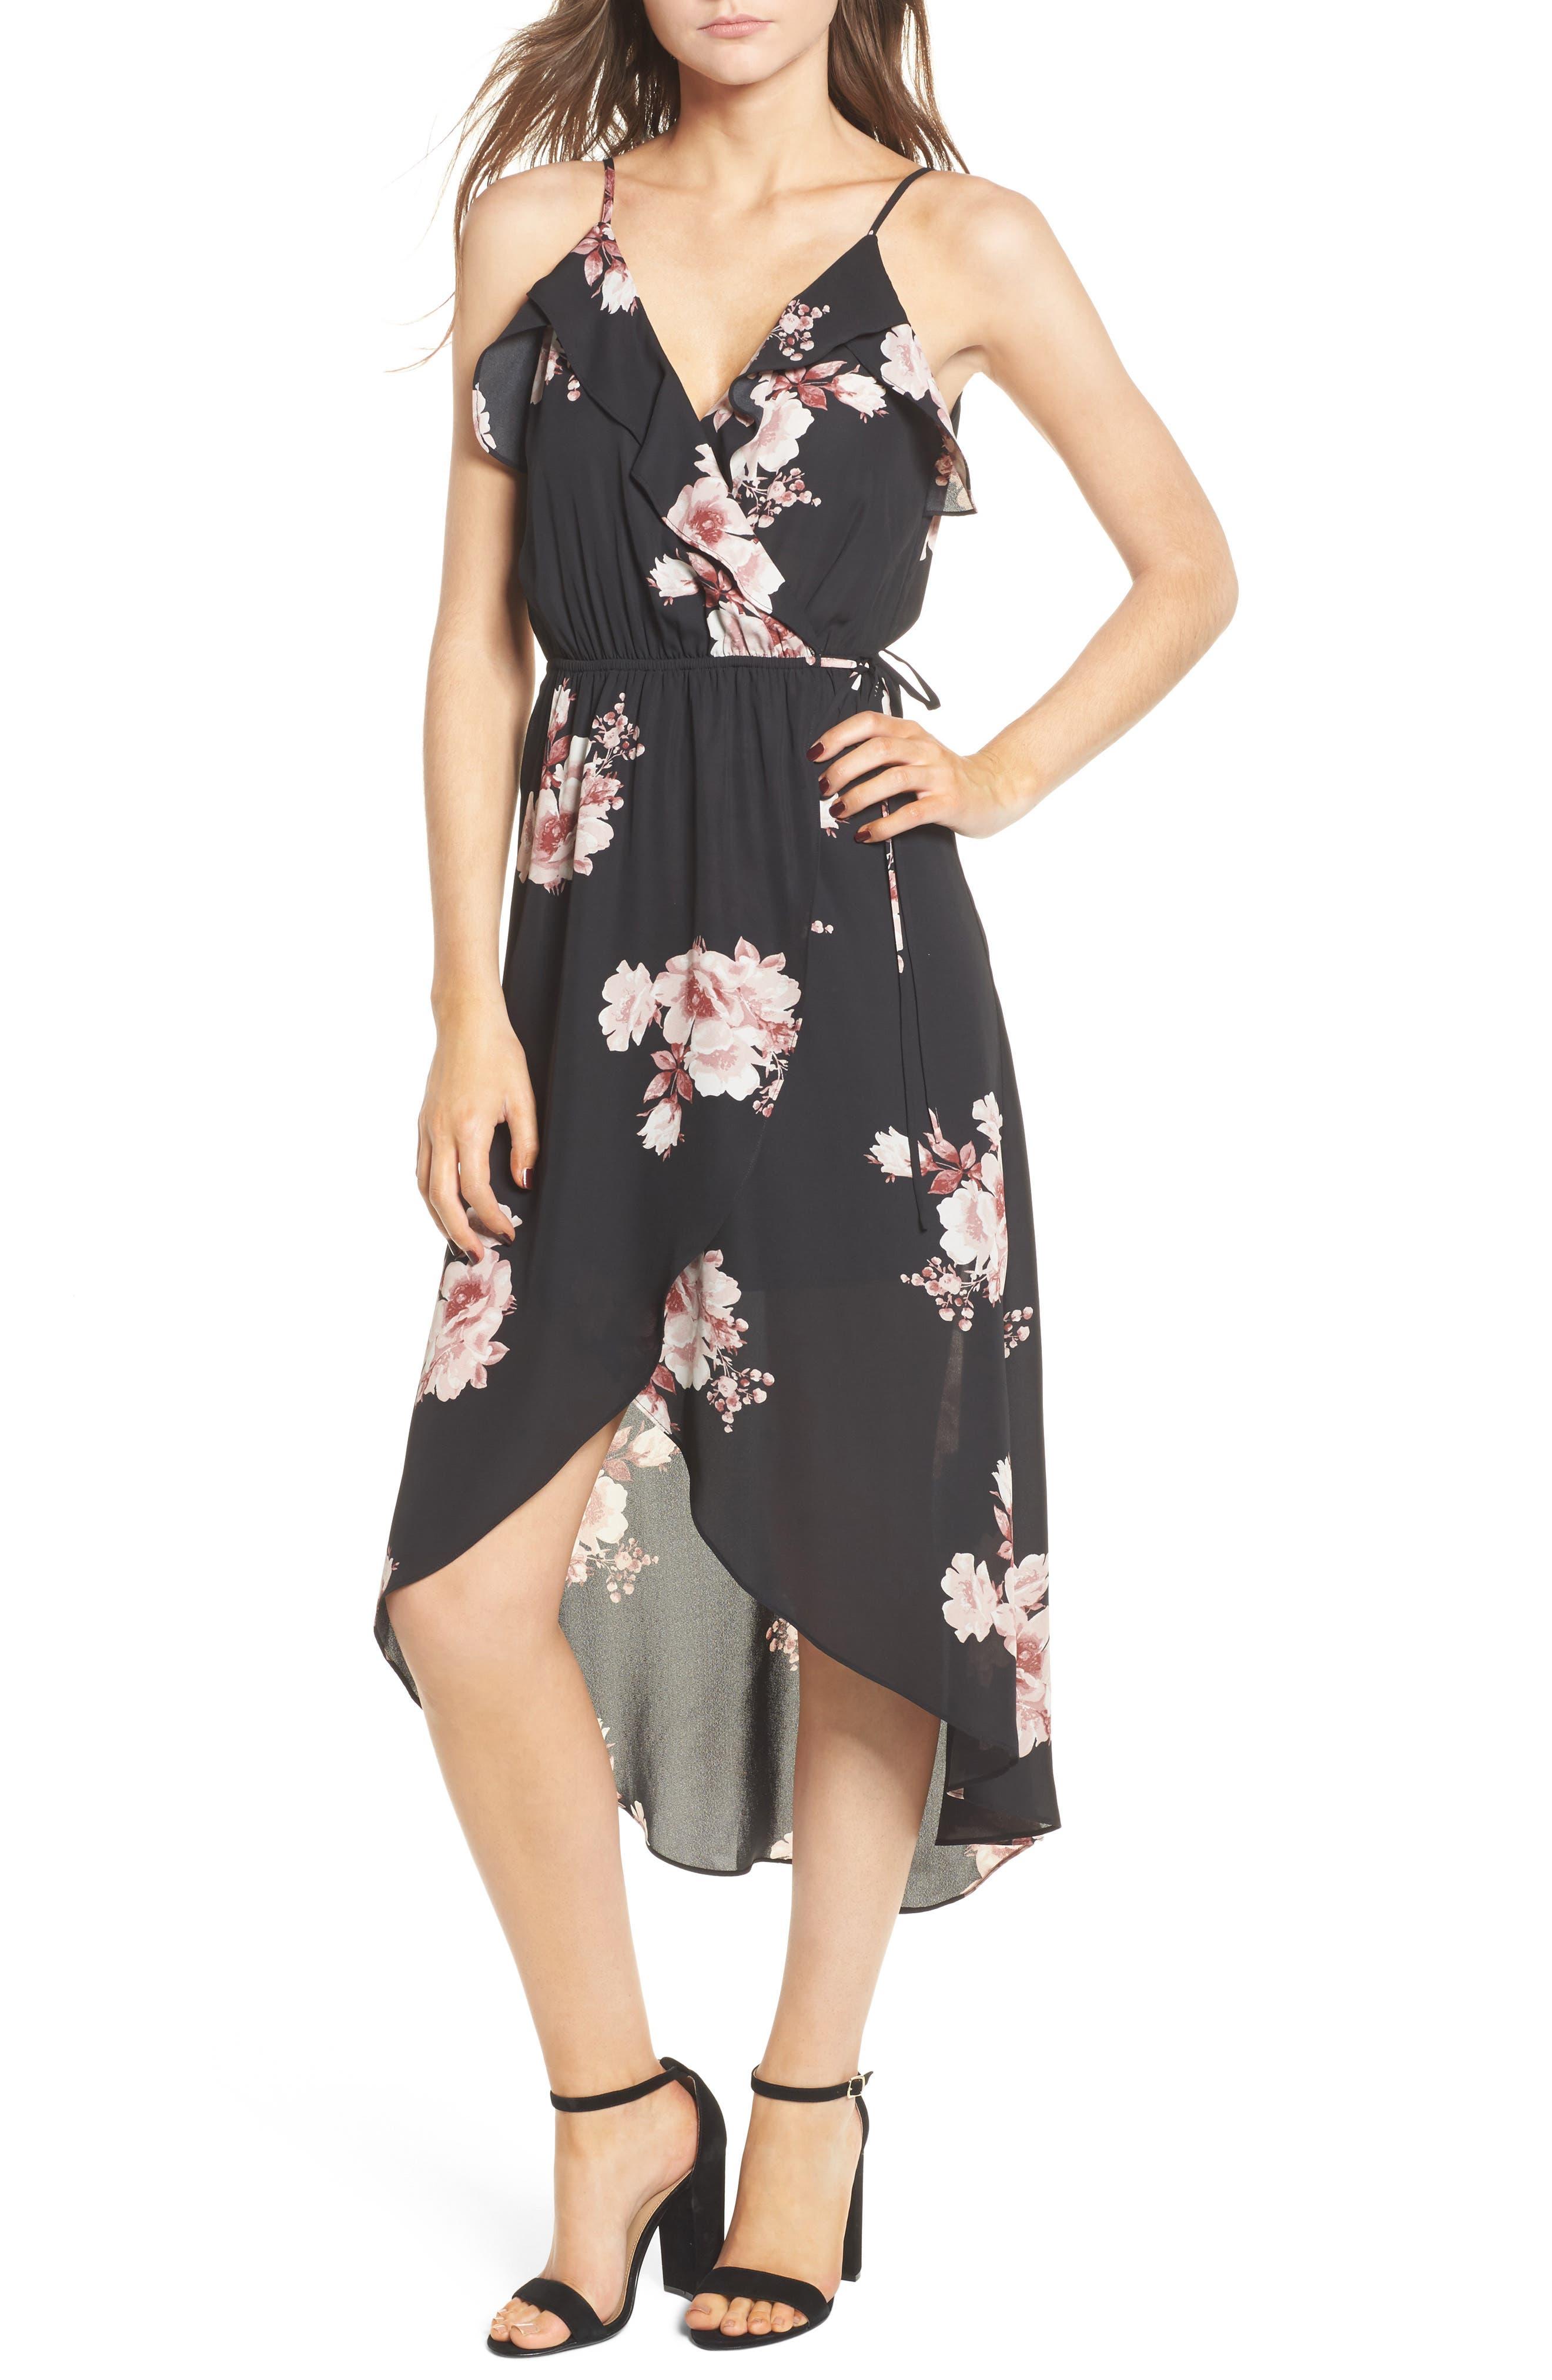 SOPRANO, Ruffle Surplice Dress, Main thumbnail 1, color, 002